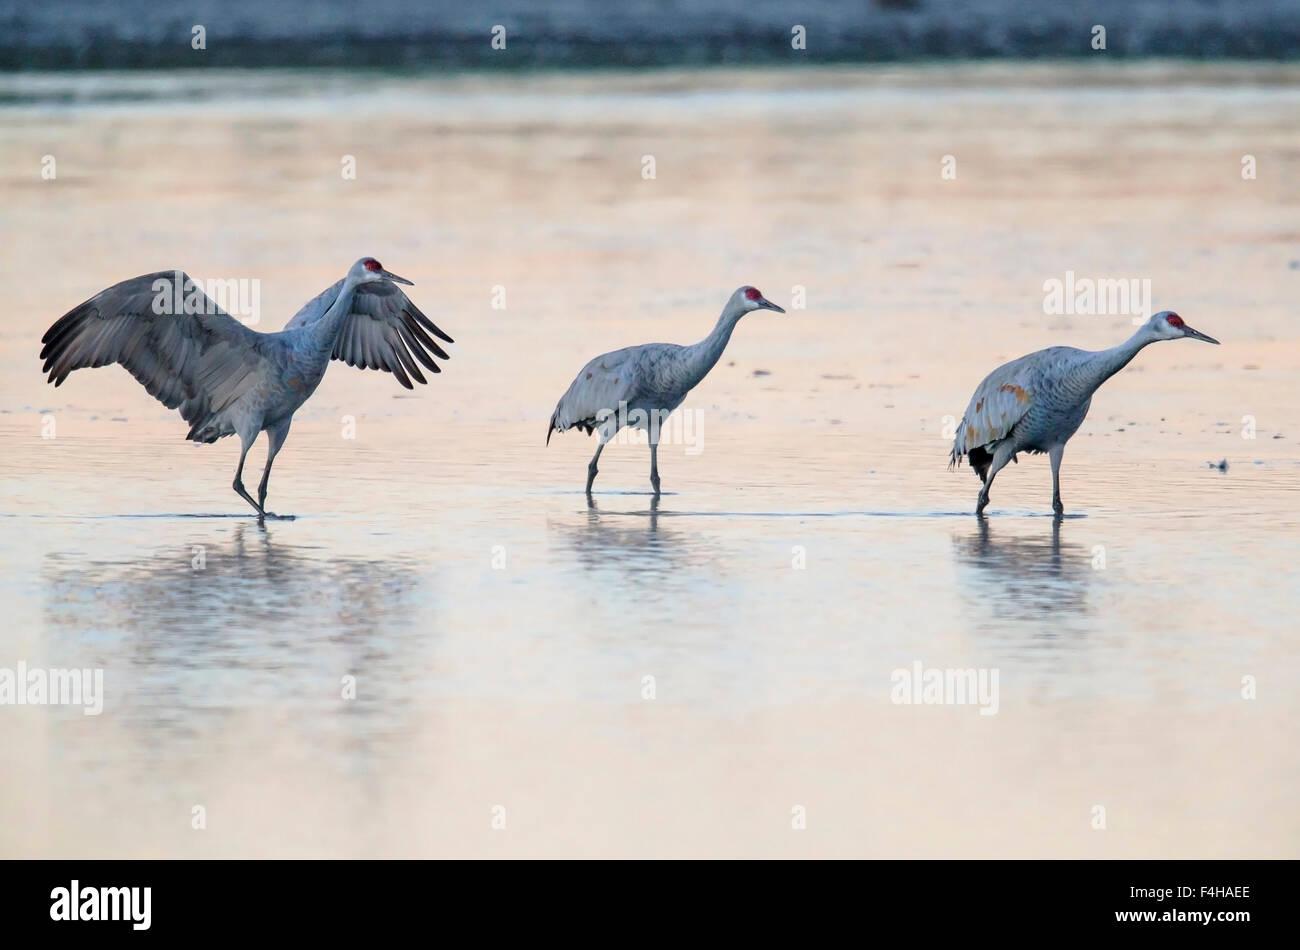 Sandhill Cranes in pond at sunrise, Monte Vista National Wildlife Refuge, Colorado, USA - Stock Image